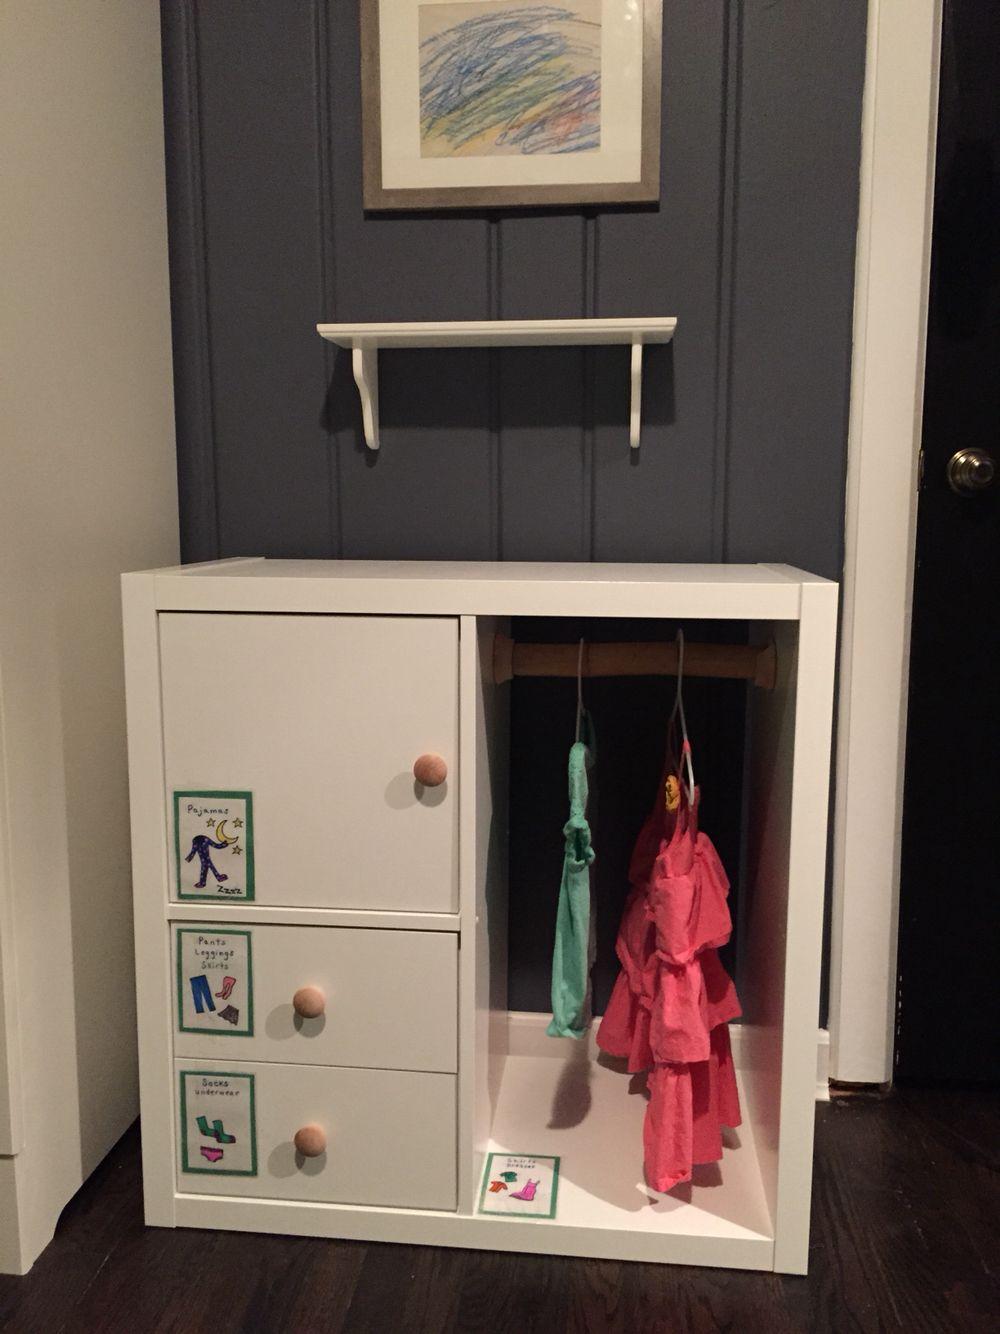 ikea hack kallax into toddler closet remove one shelf. Black Bedroom Furniture Sets. Home Design Ideas